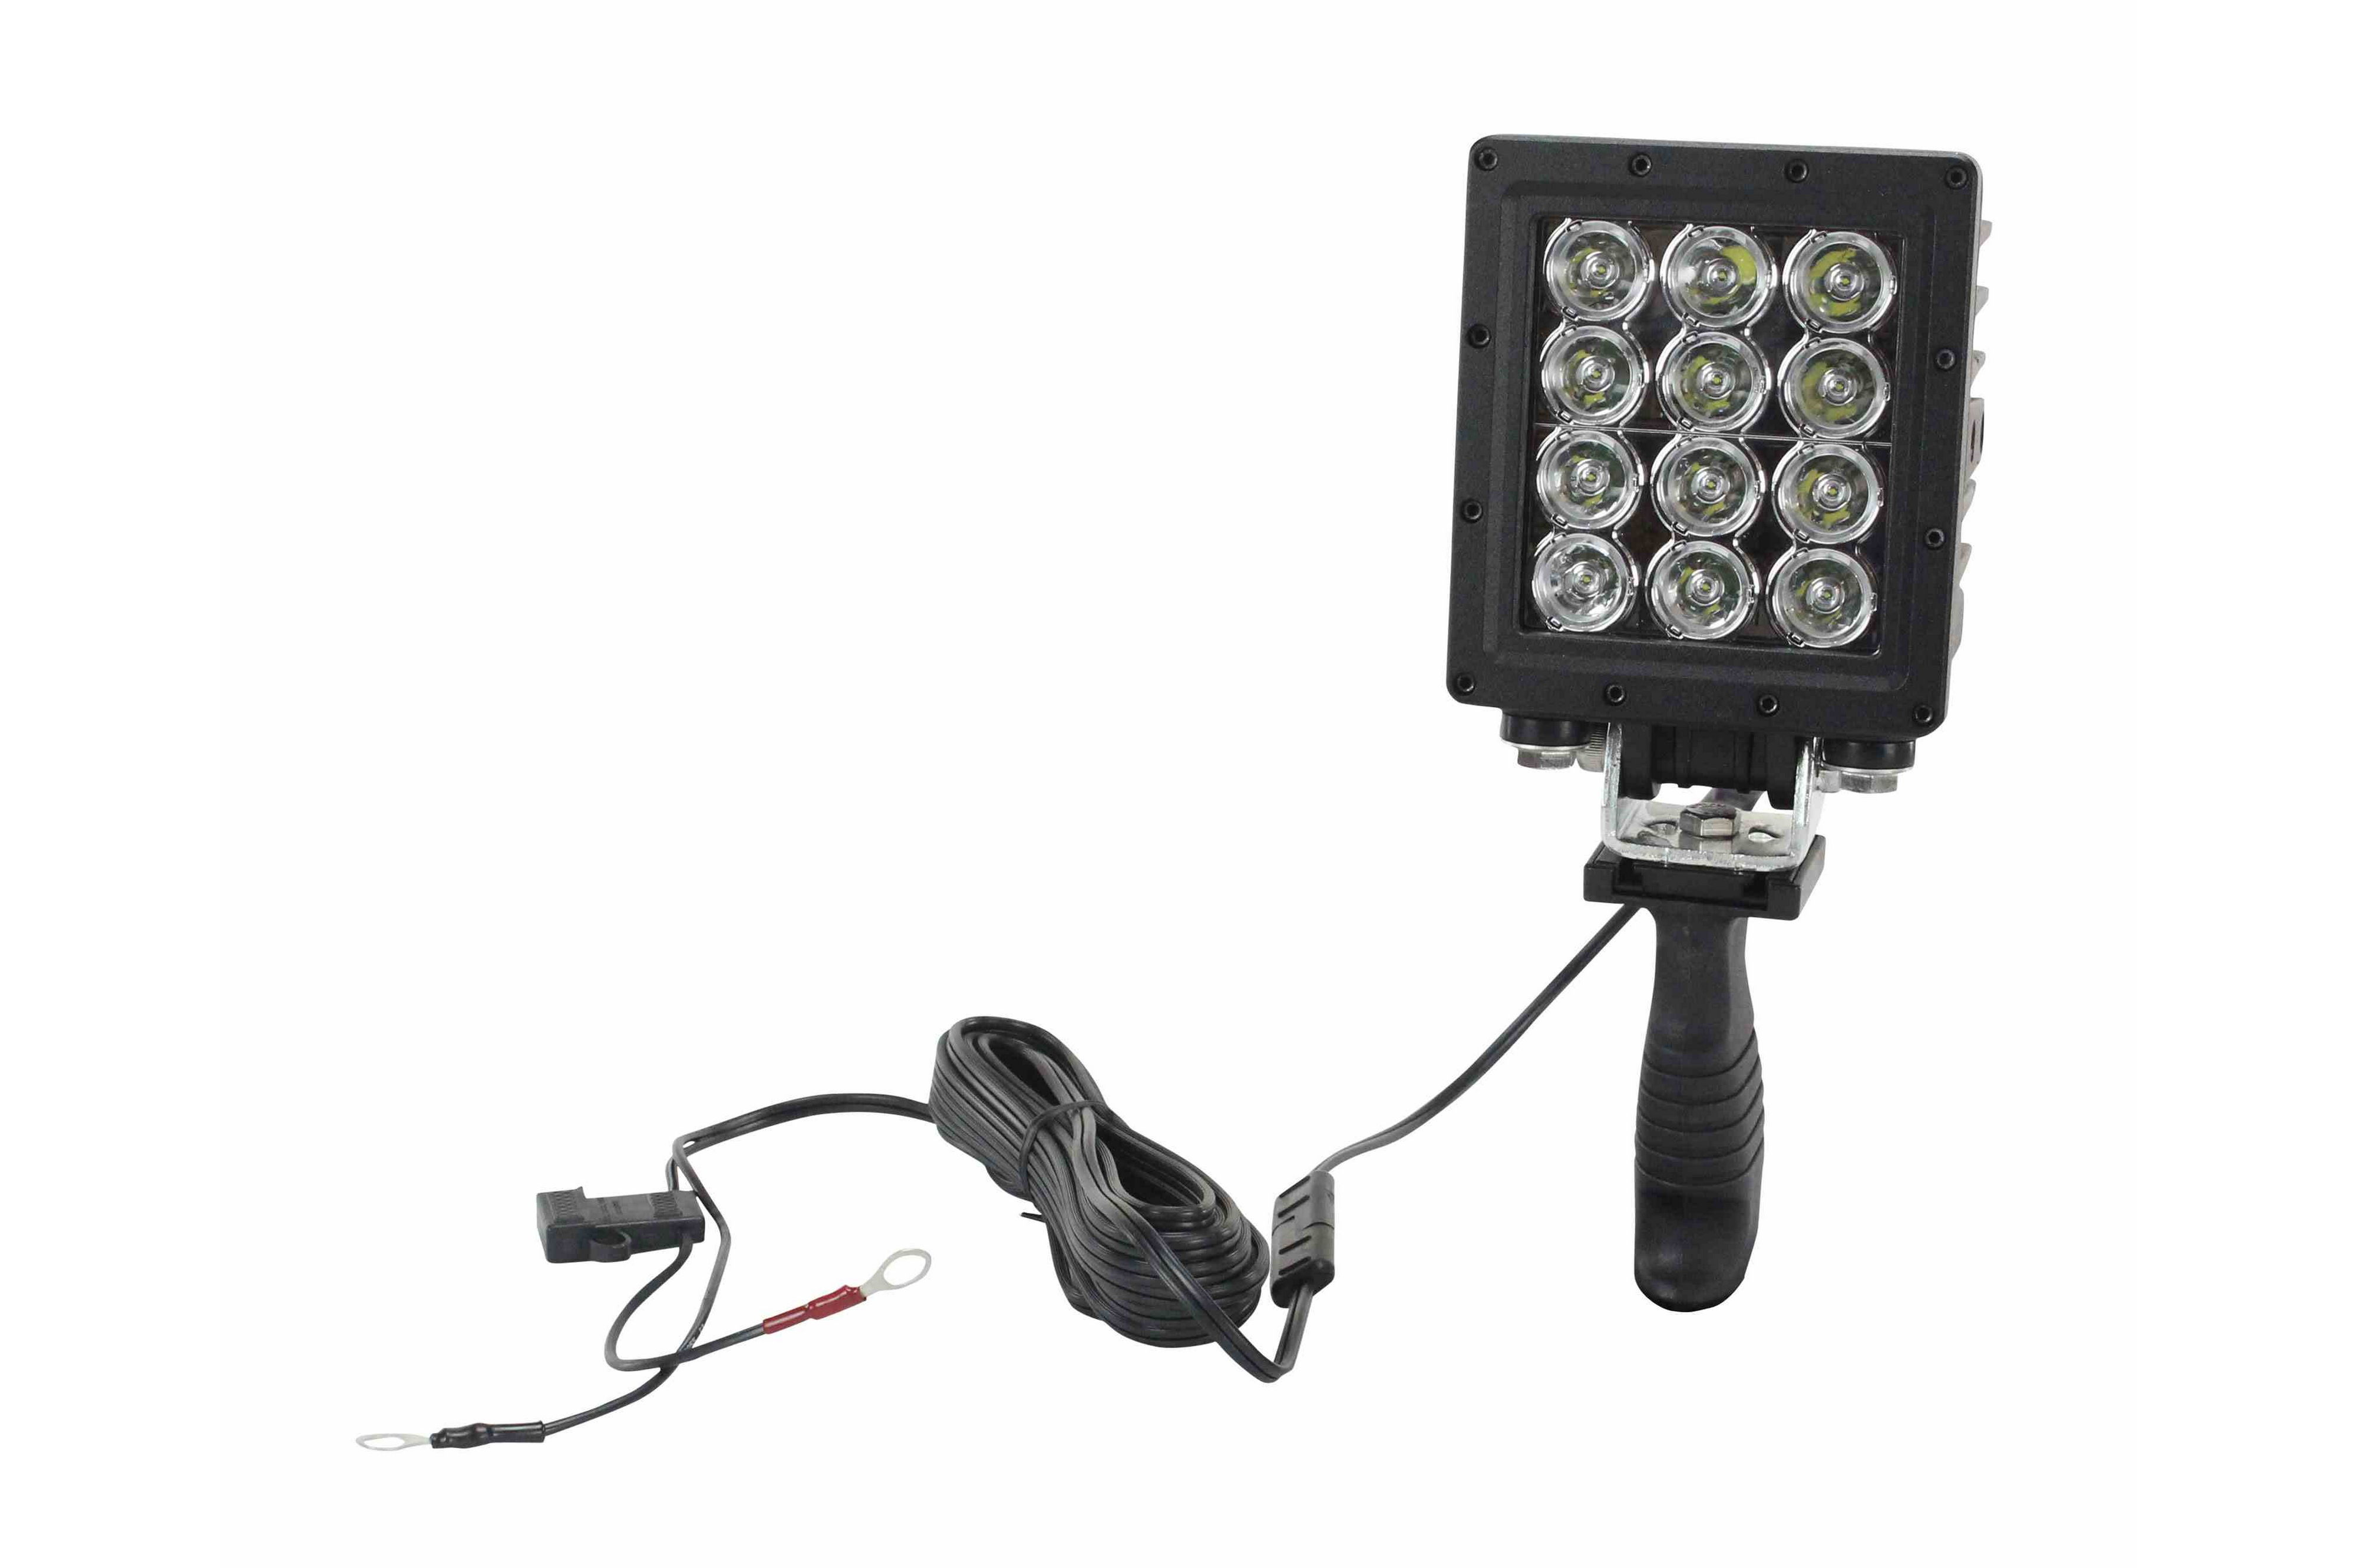 Handheld Spotlight Wiring Diagram | Wiring Diagram Liry on spotlight lighting, auto relay diagram, motorcycle spotlight relay switch diagram, light relay wire diagram, battery diagram,